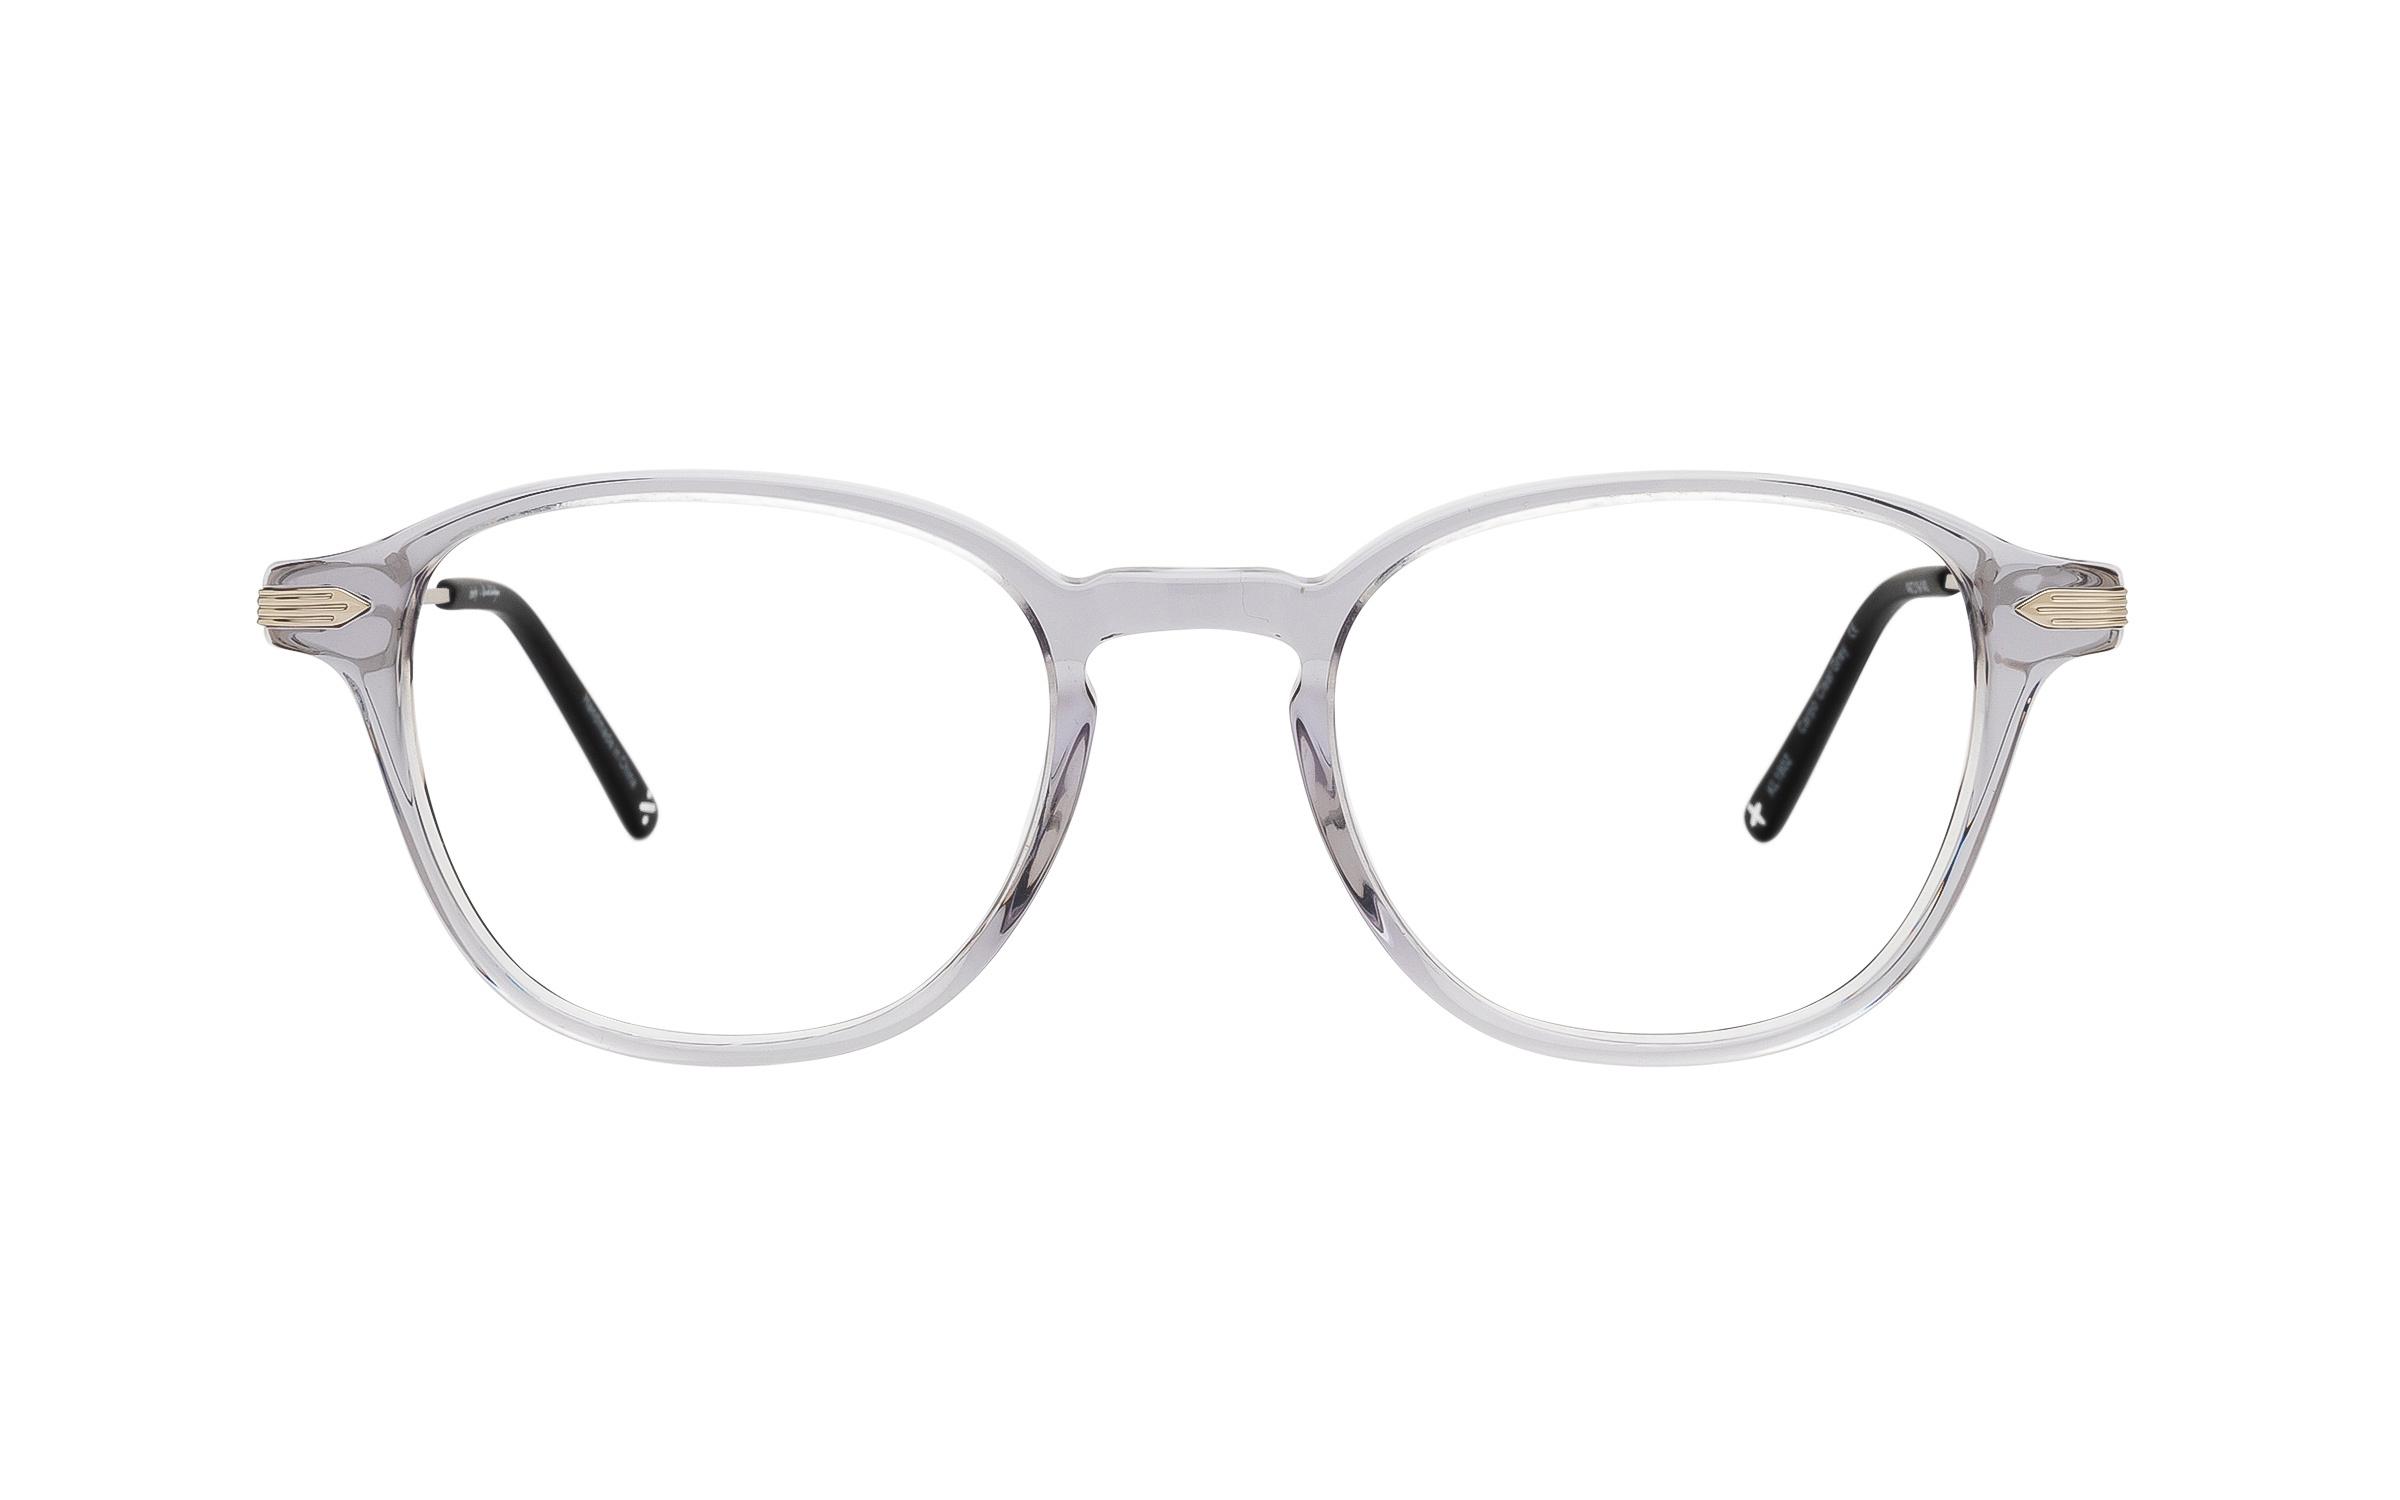 coastal.com - Derek Cardigan Carpo (49) Eyeglasses and Frame in Clear Grey | Acetate/Metal – Online Coastal 55.00 USD